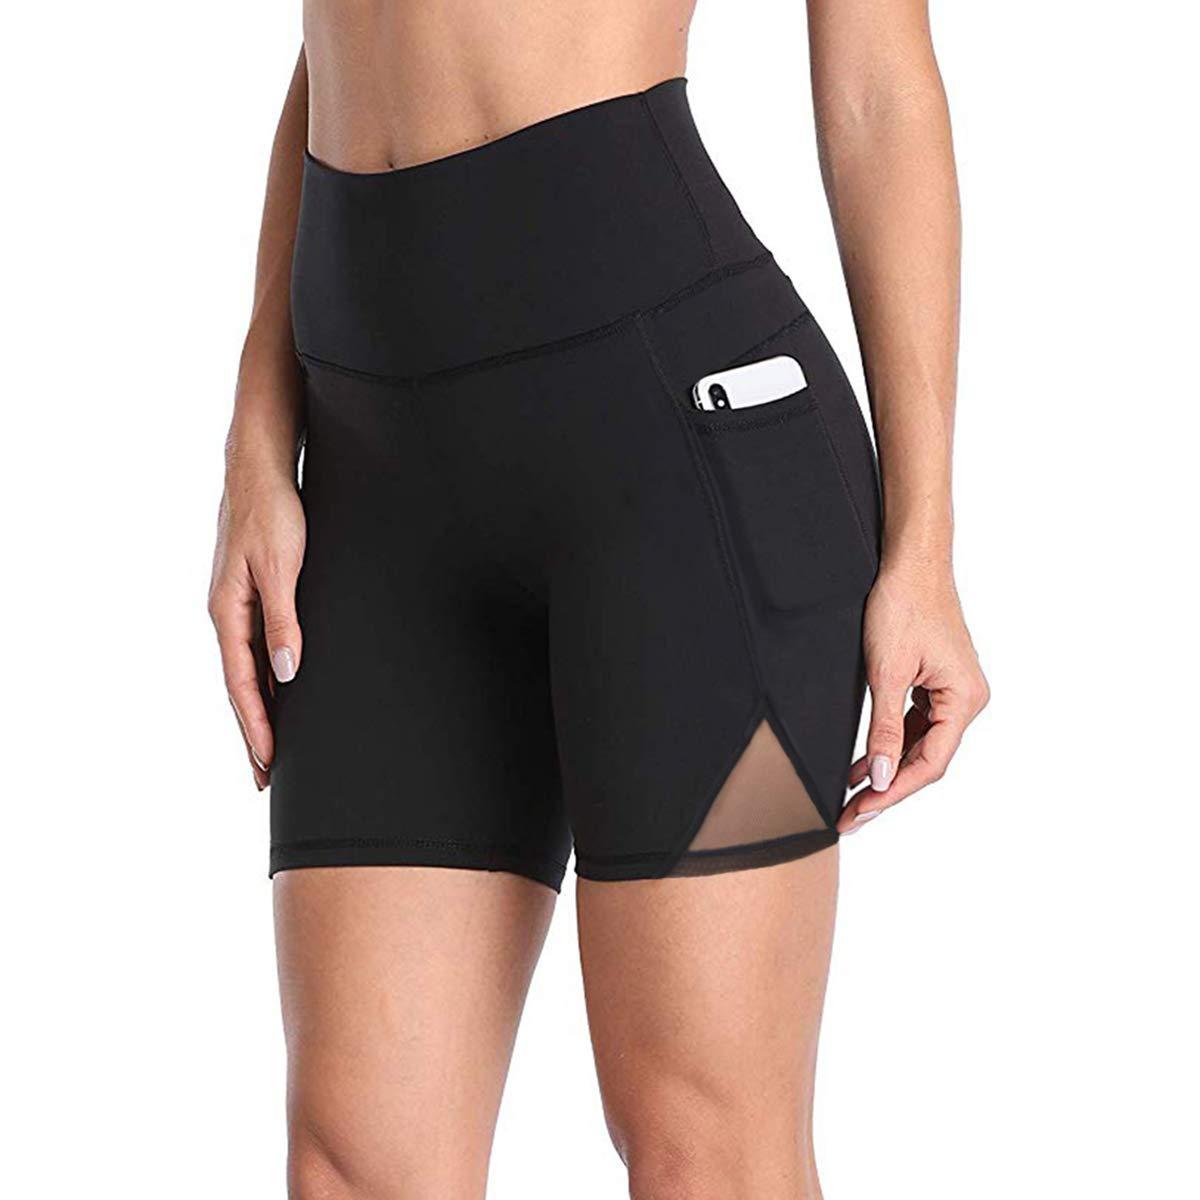 DILANNI Women Running Shorts with Pockets High Waist Yoga Bike Workout Shorts(Black XS)